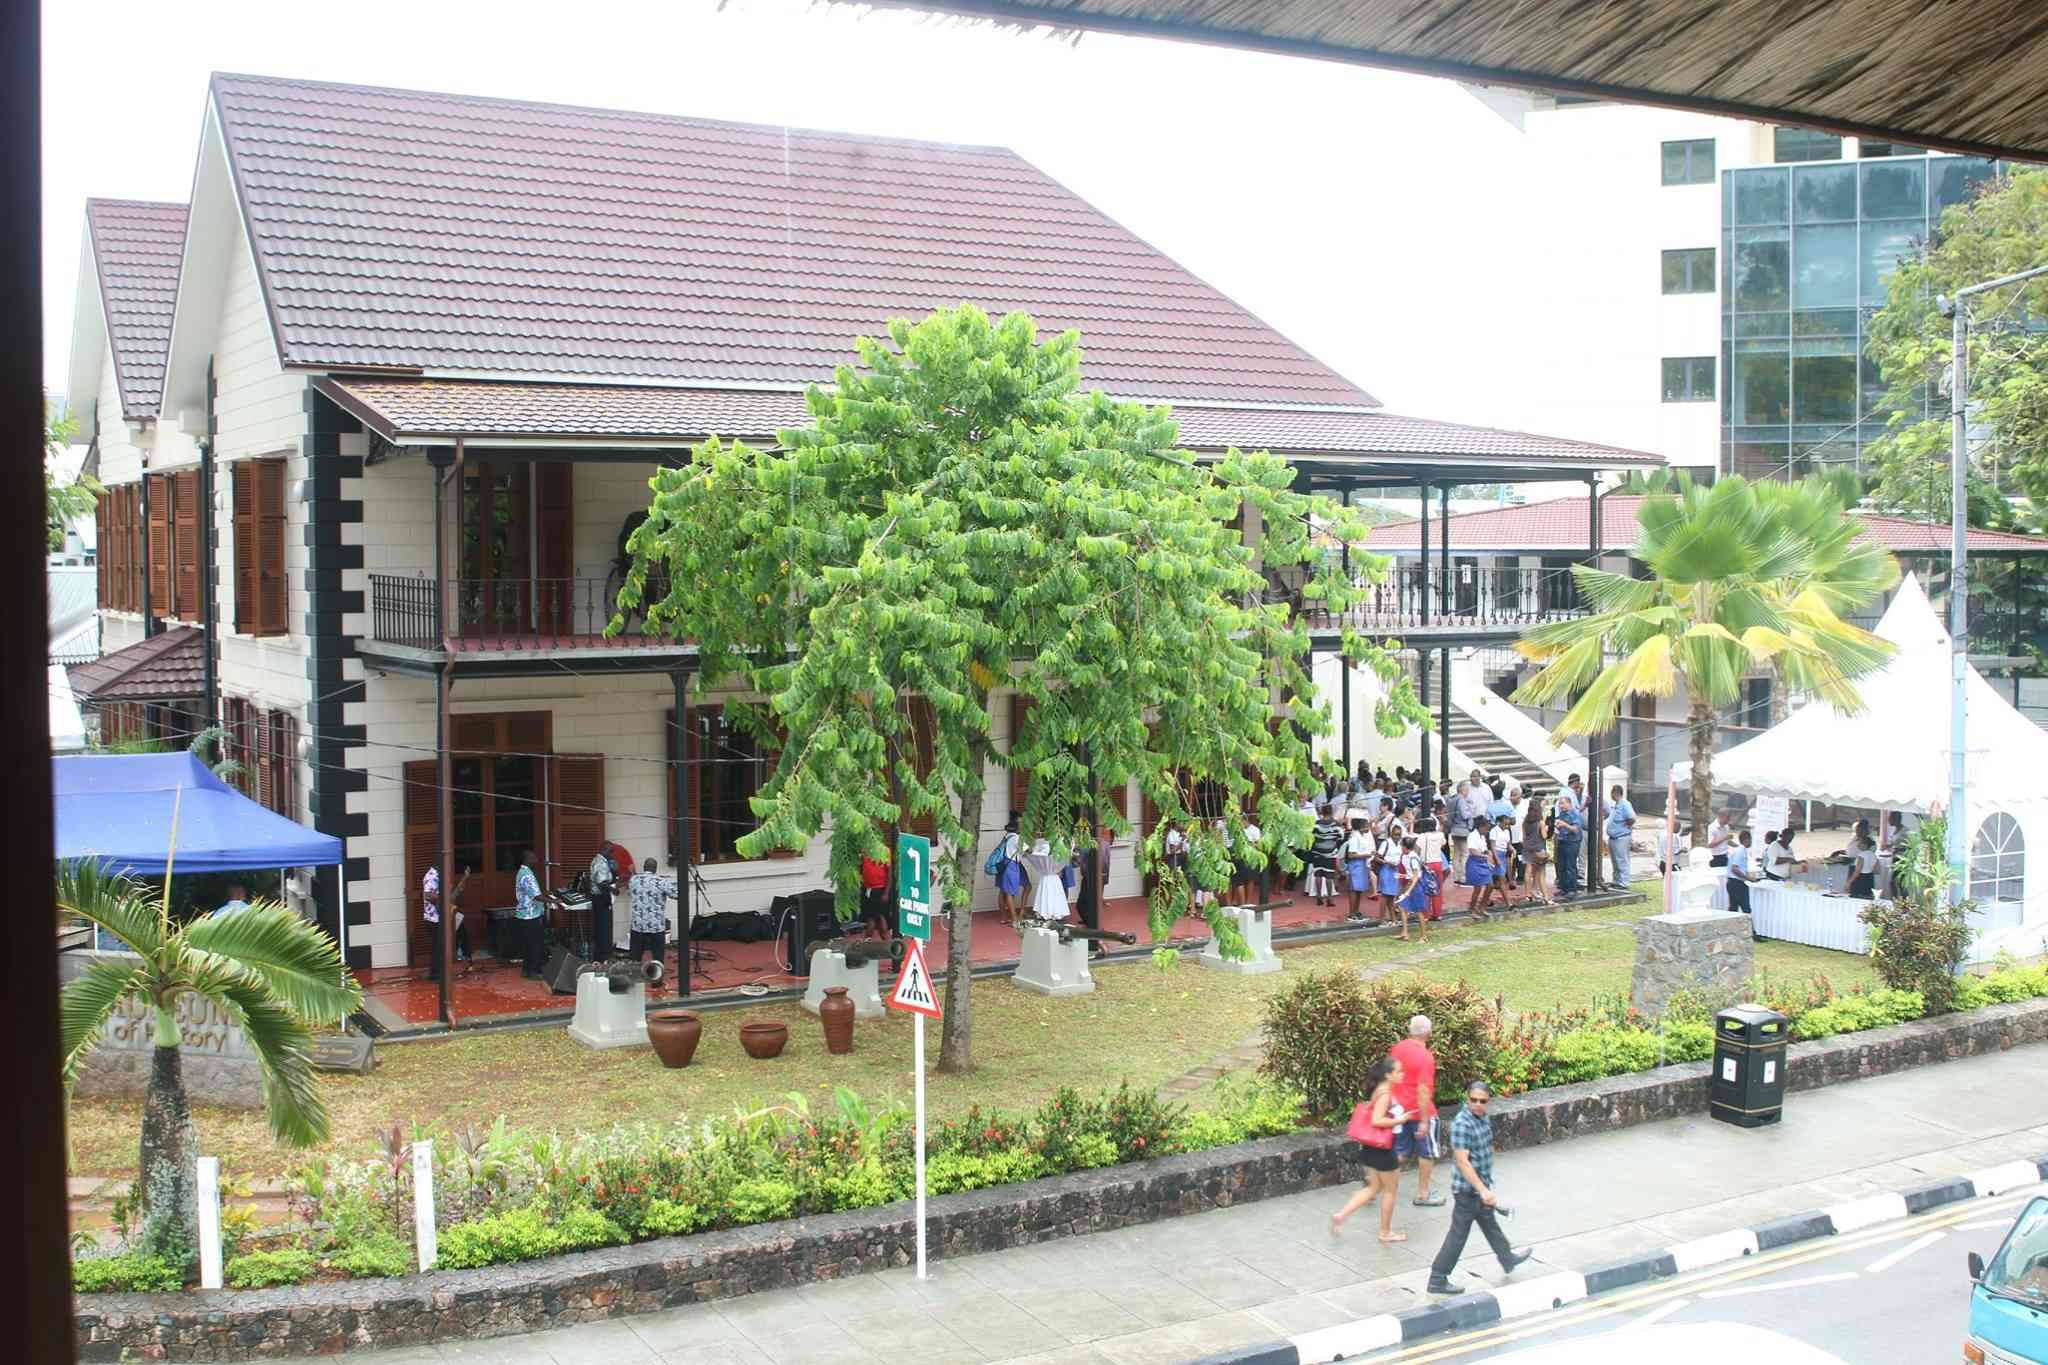 Seychelles National History Museum